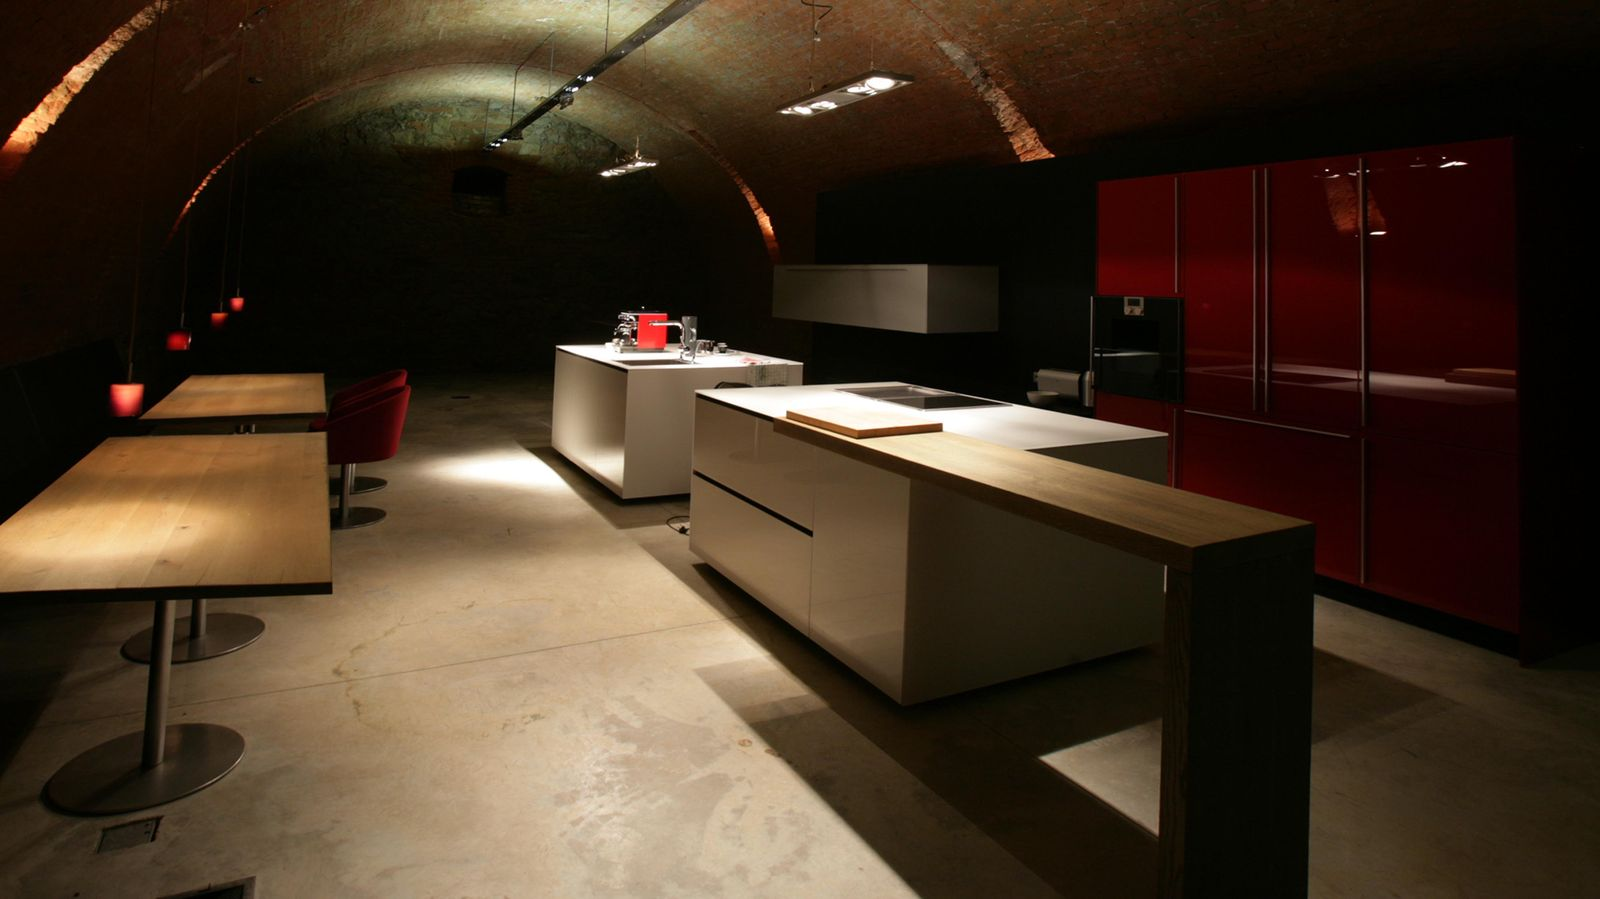 plan 3 kuchyně / Valcucine / Выставка кухни plan 3 кухни